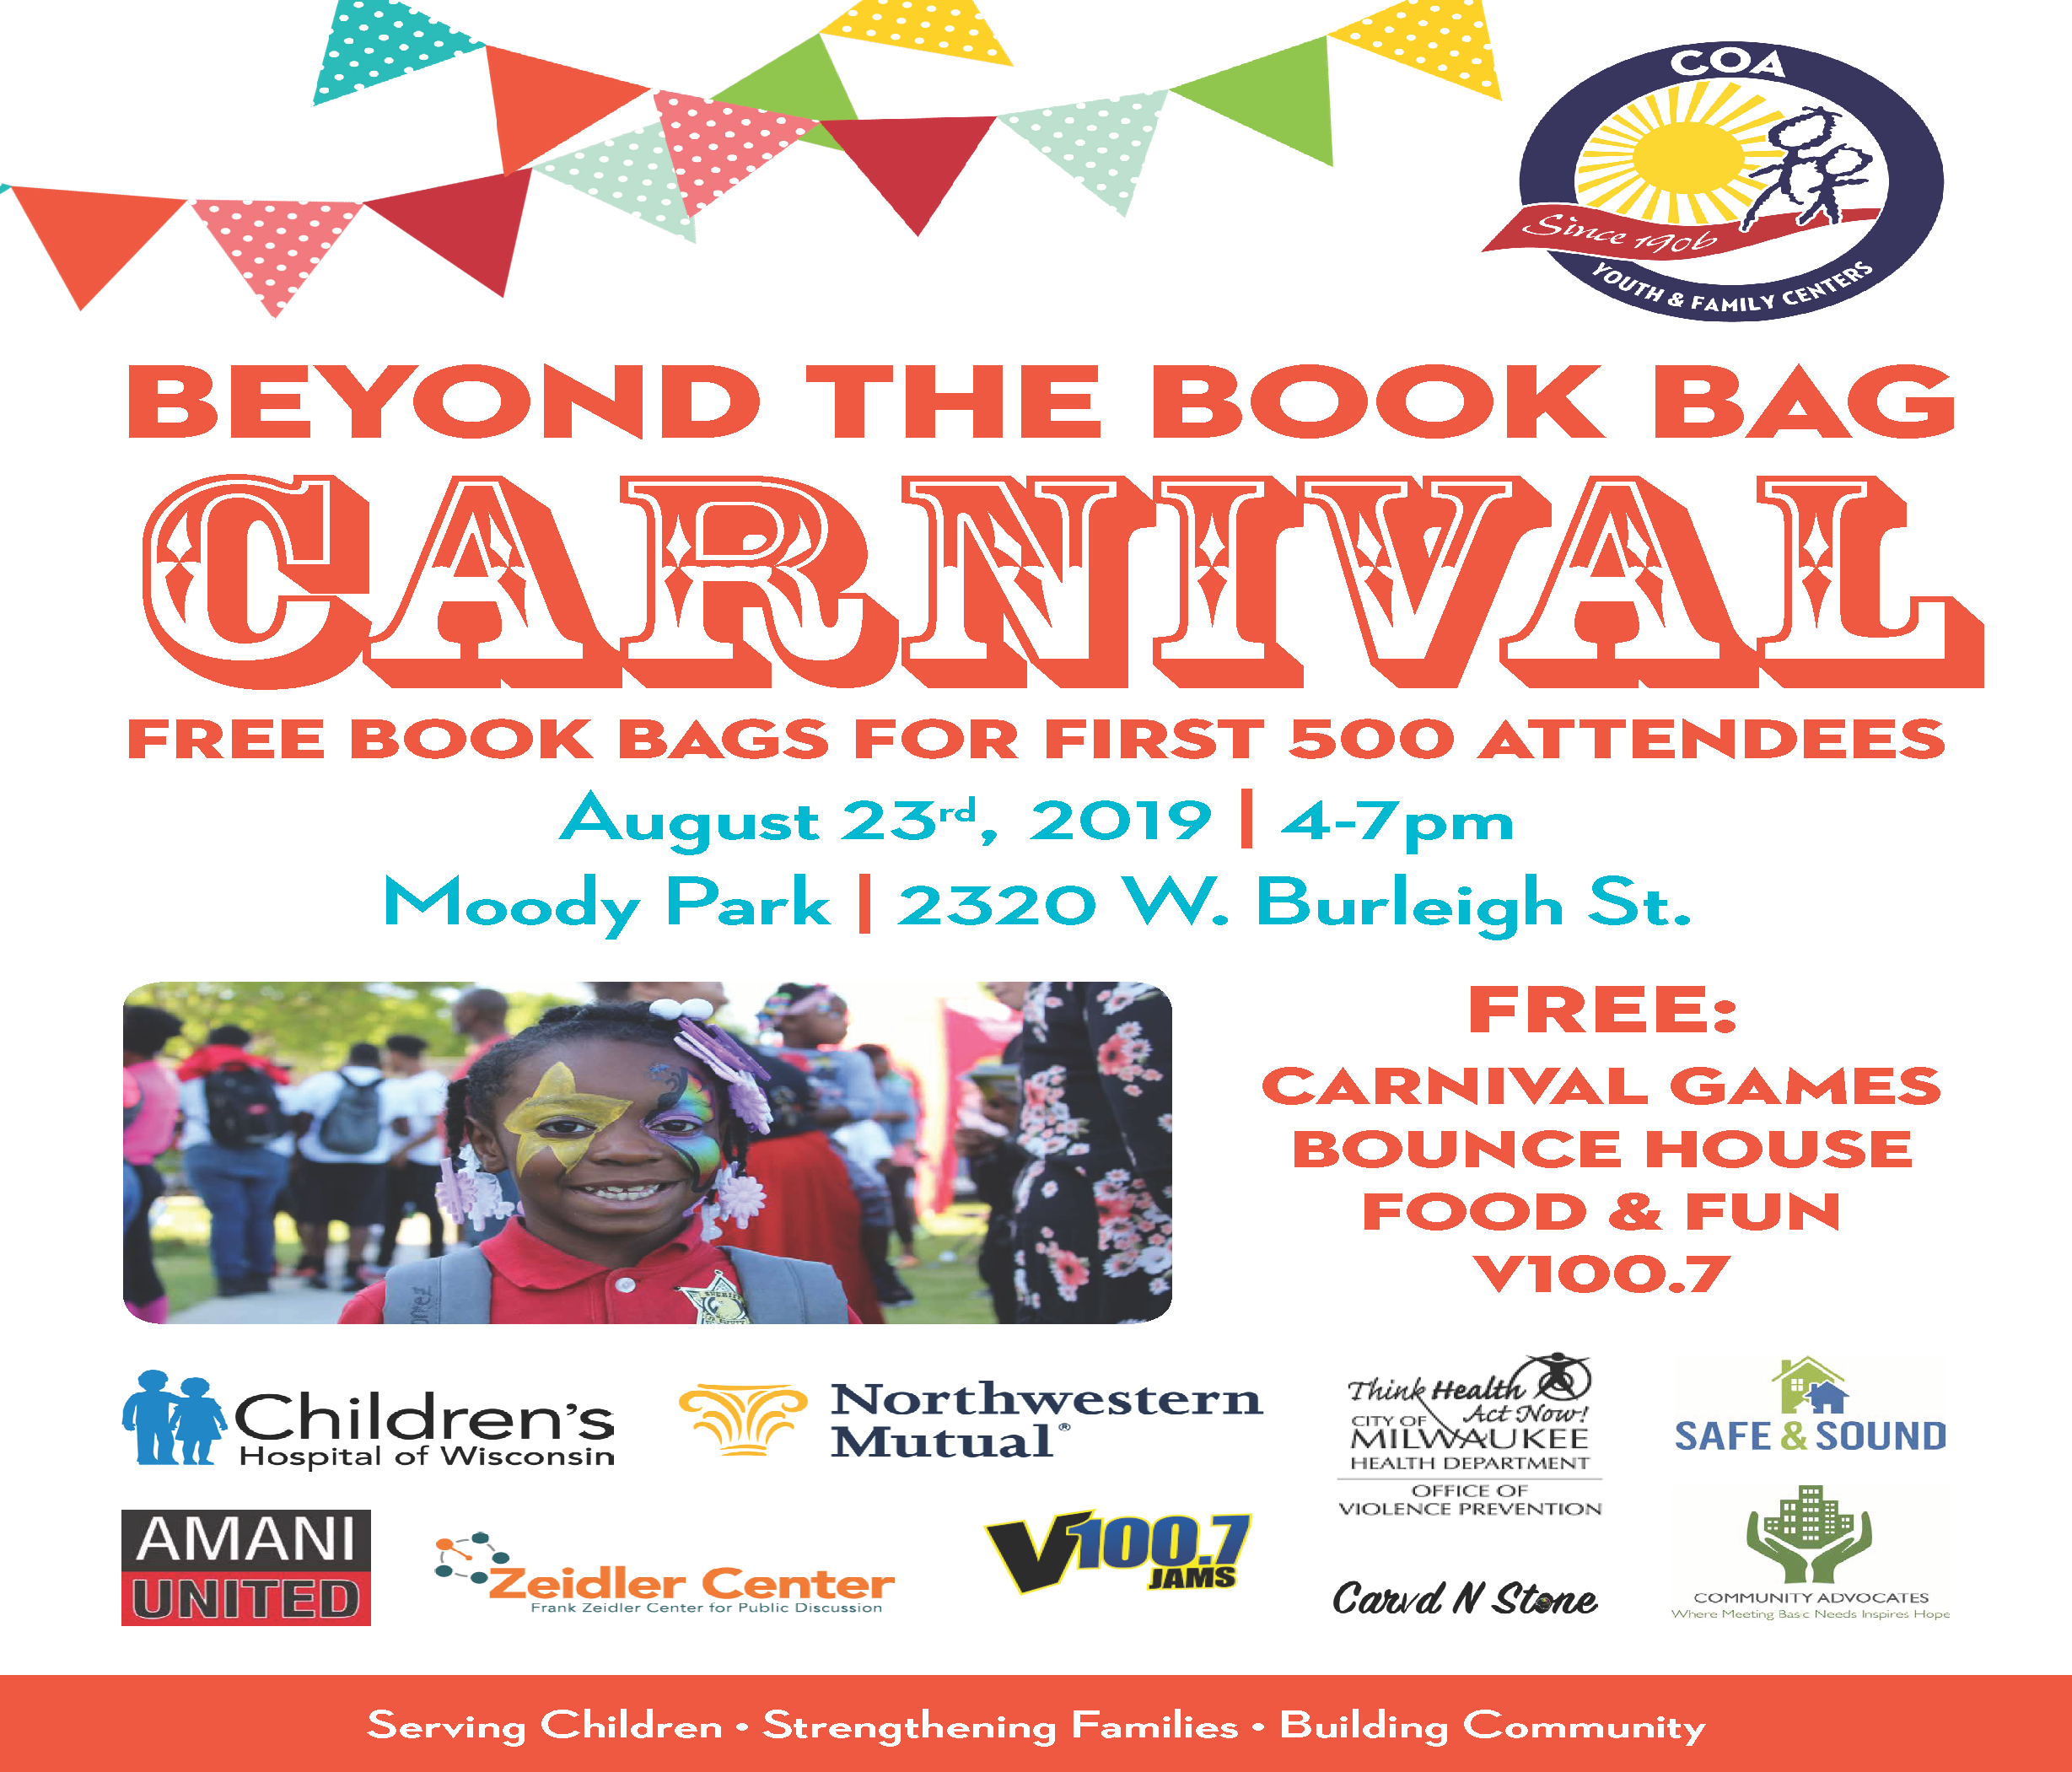 Beyond the Book Bag Carnival